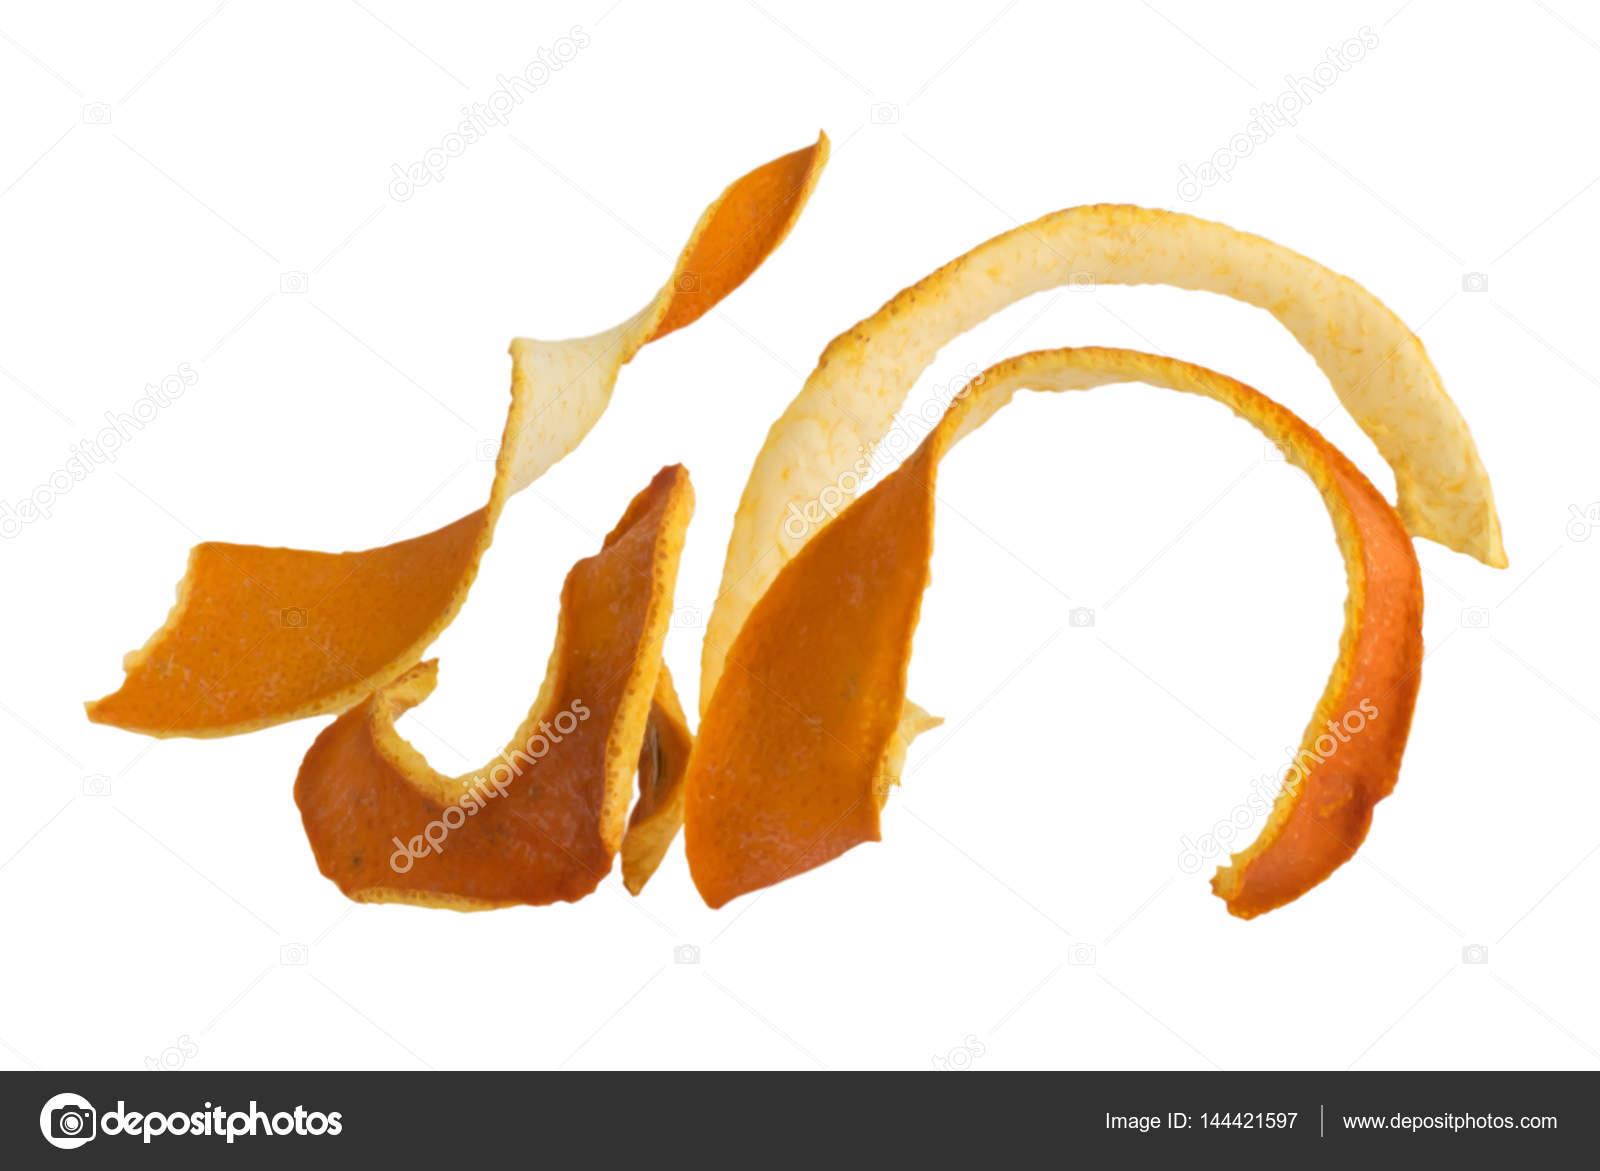 s cher la peau d orange isol e on white background photographie oksana6299956 144421597. Black Bedroom Furniture Sets. Home Design Ideas